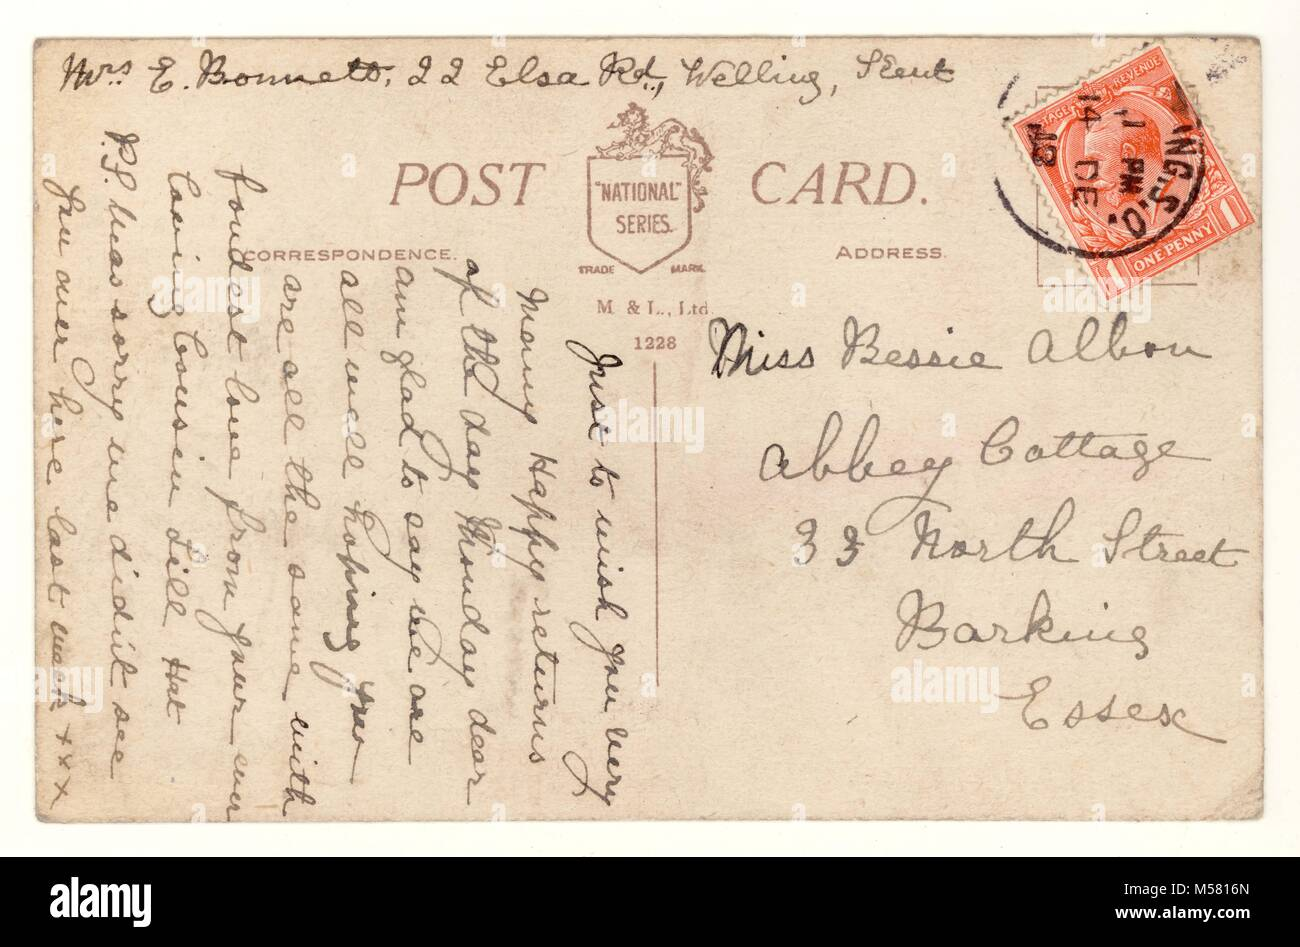 Reverse of WW1 era postcard .- posted 14 December 1918, Welling. U.K. - Stock Image